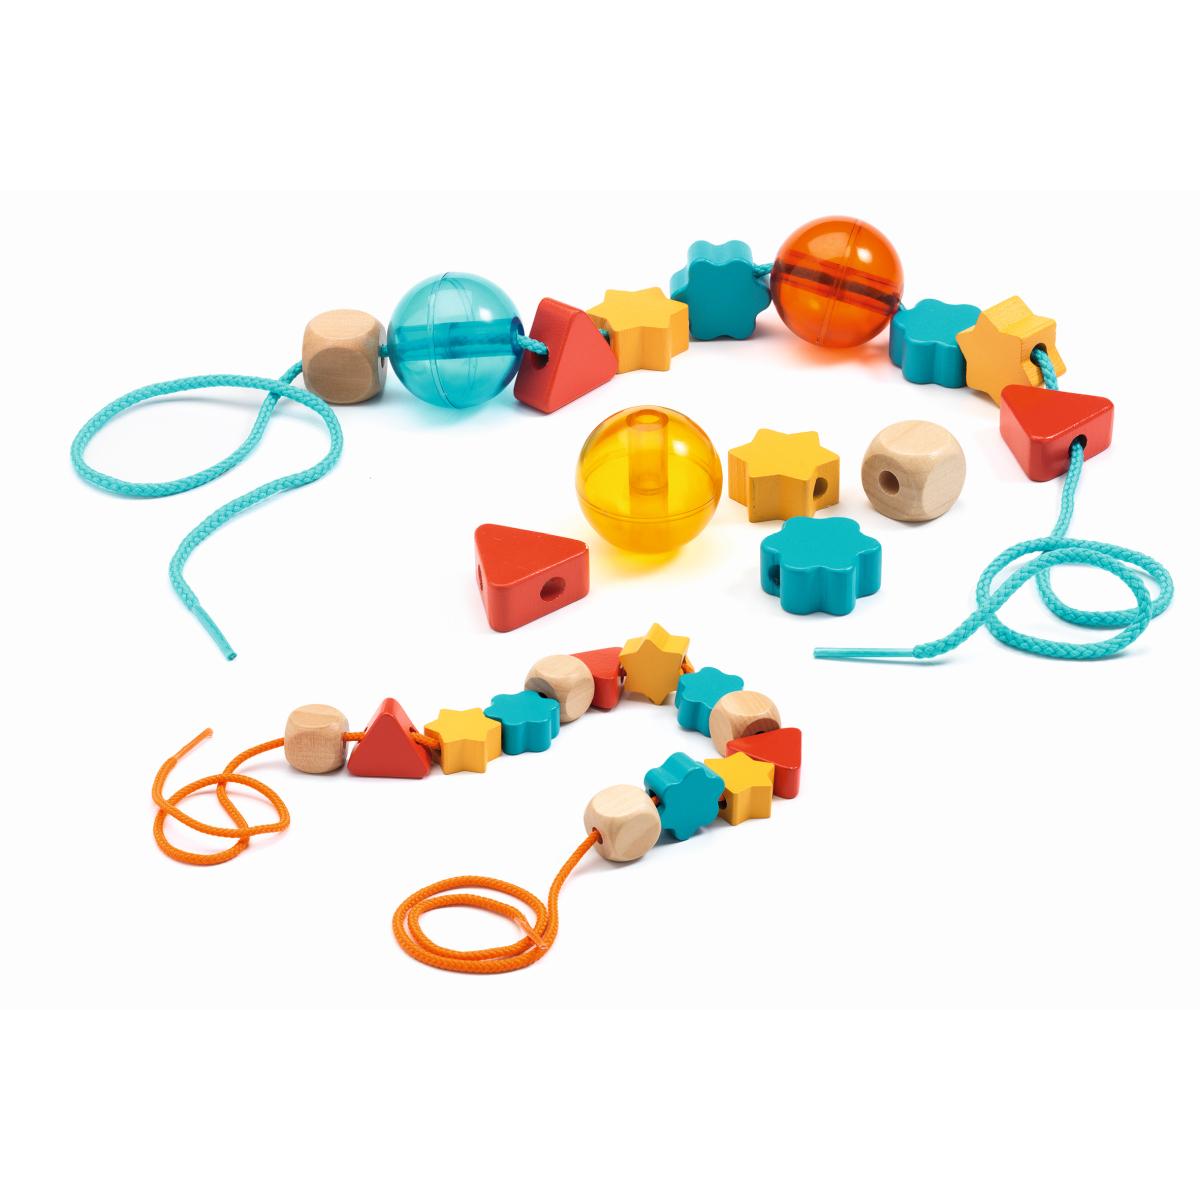 Kleinkind Lernspielzeug: Filacolor Ball